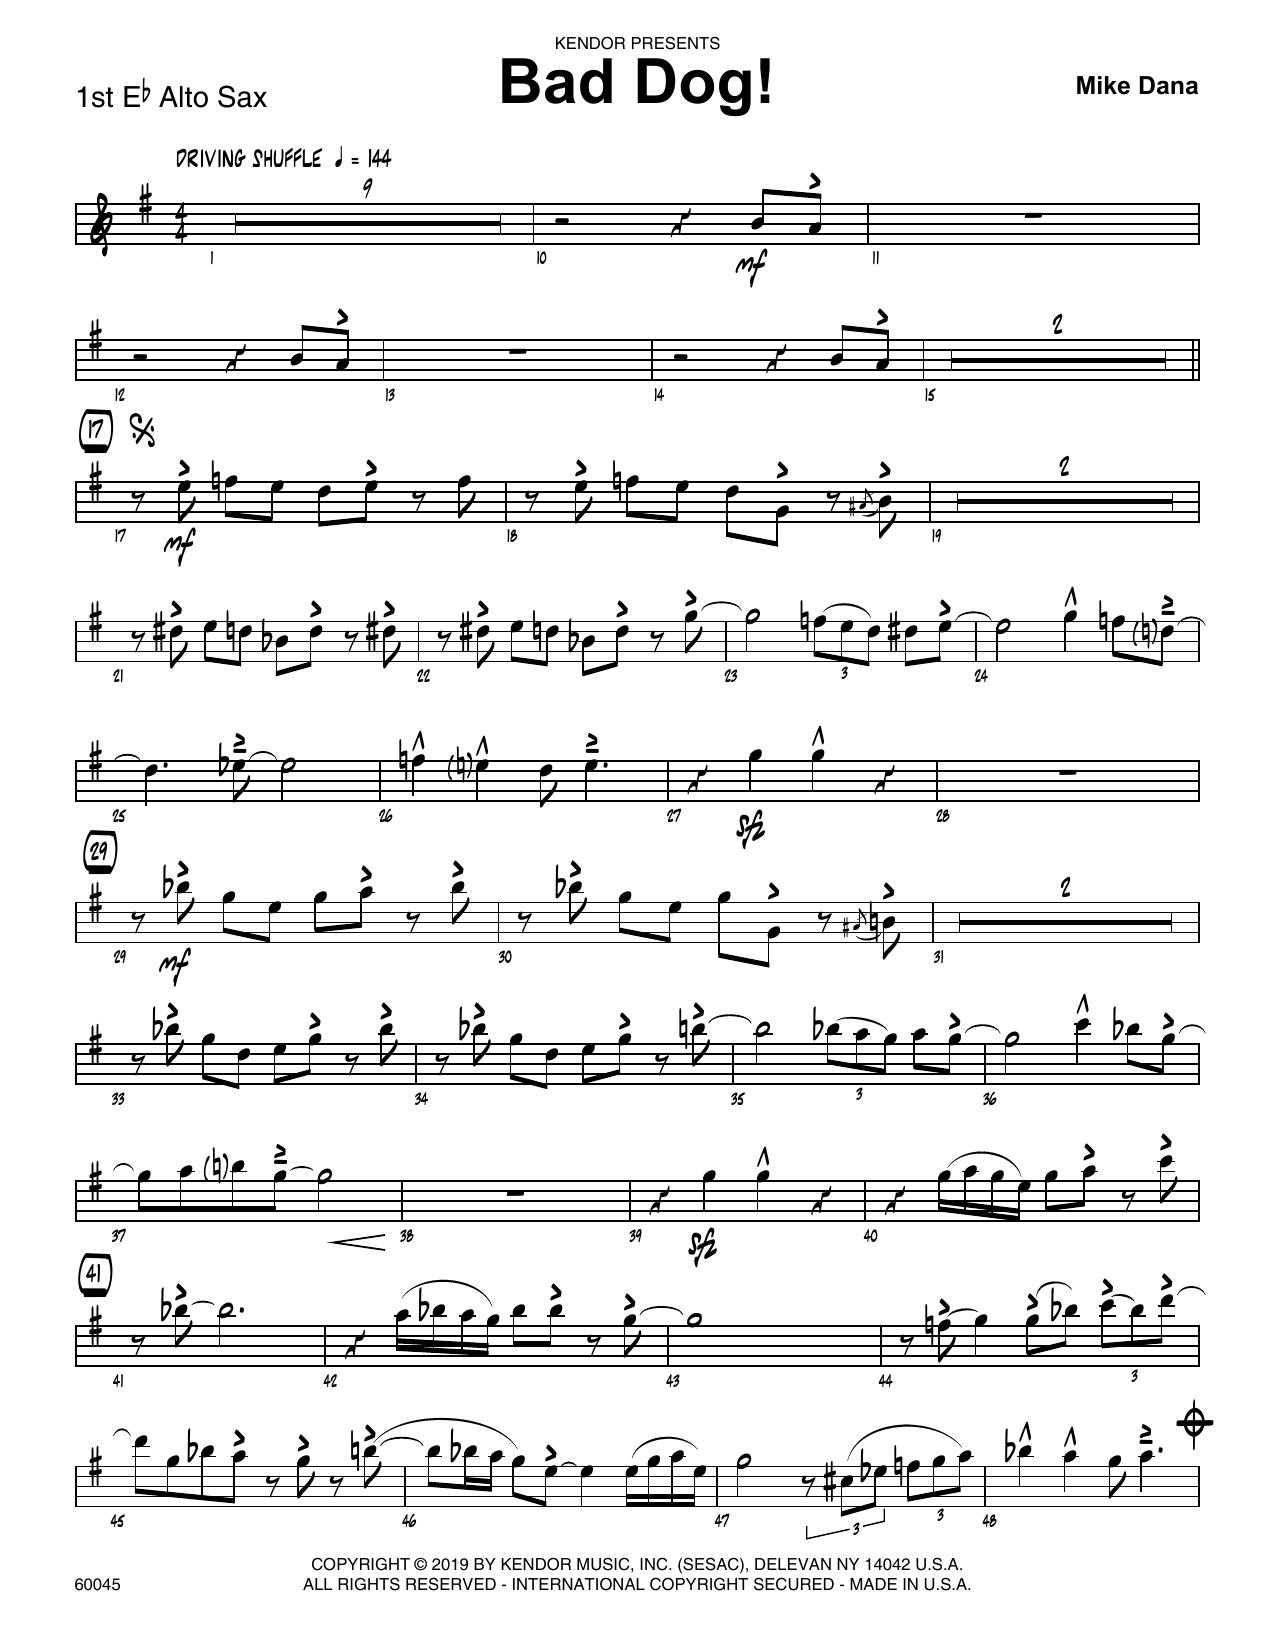 Mike Dana Bad Dog! - 1st Eb Alto Saxophone sheet music notes and chords. Download Printable PDF.